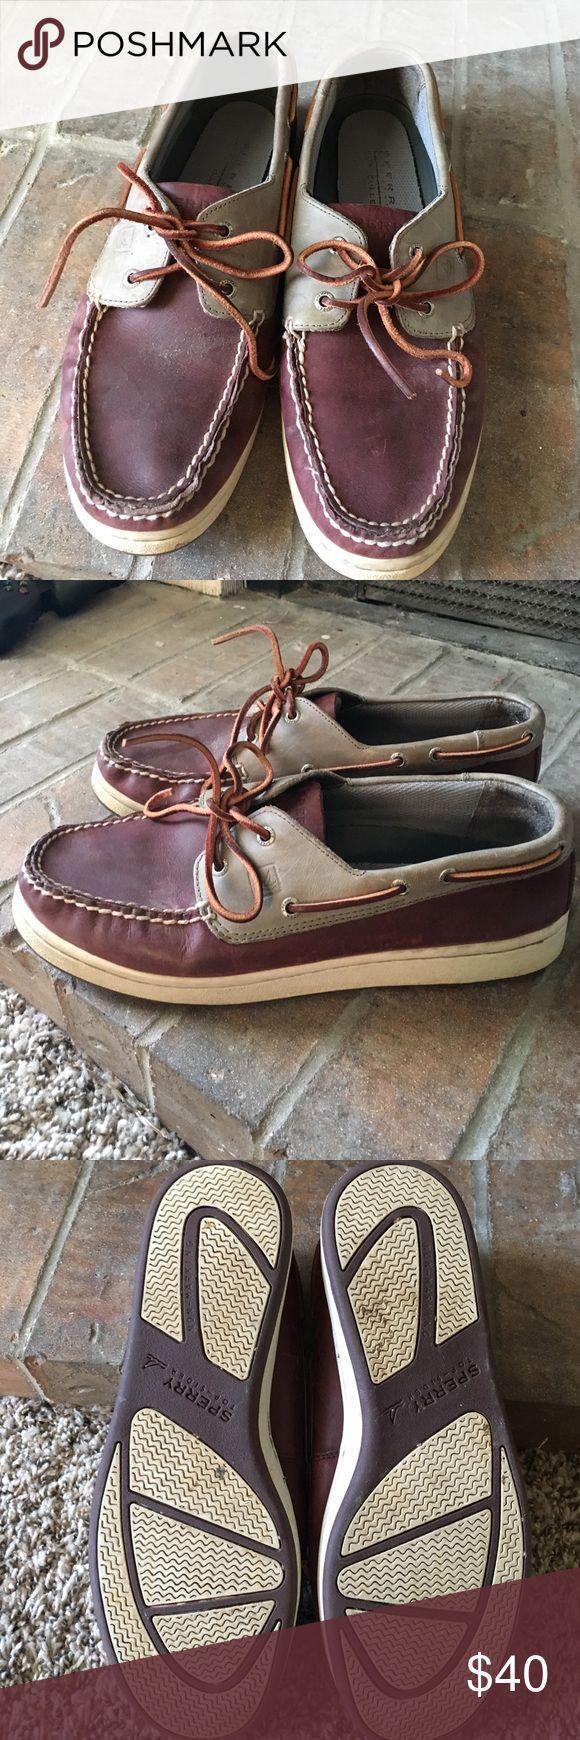 Men's Sperry Top Sider Men's Sperry Top Sider's SZ 10 Sperry Top-Sider Shoes Boat Shoes